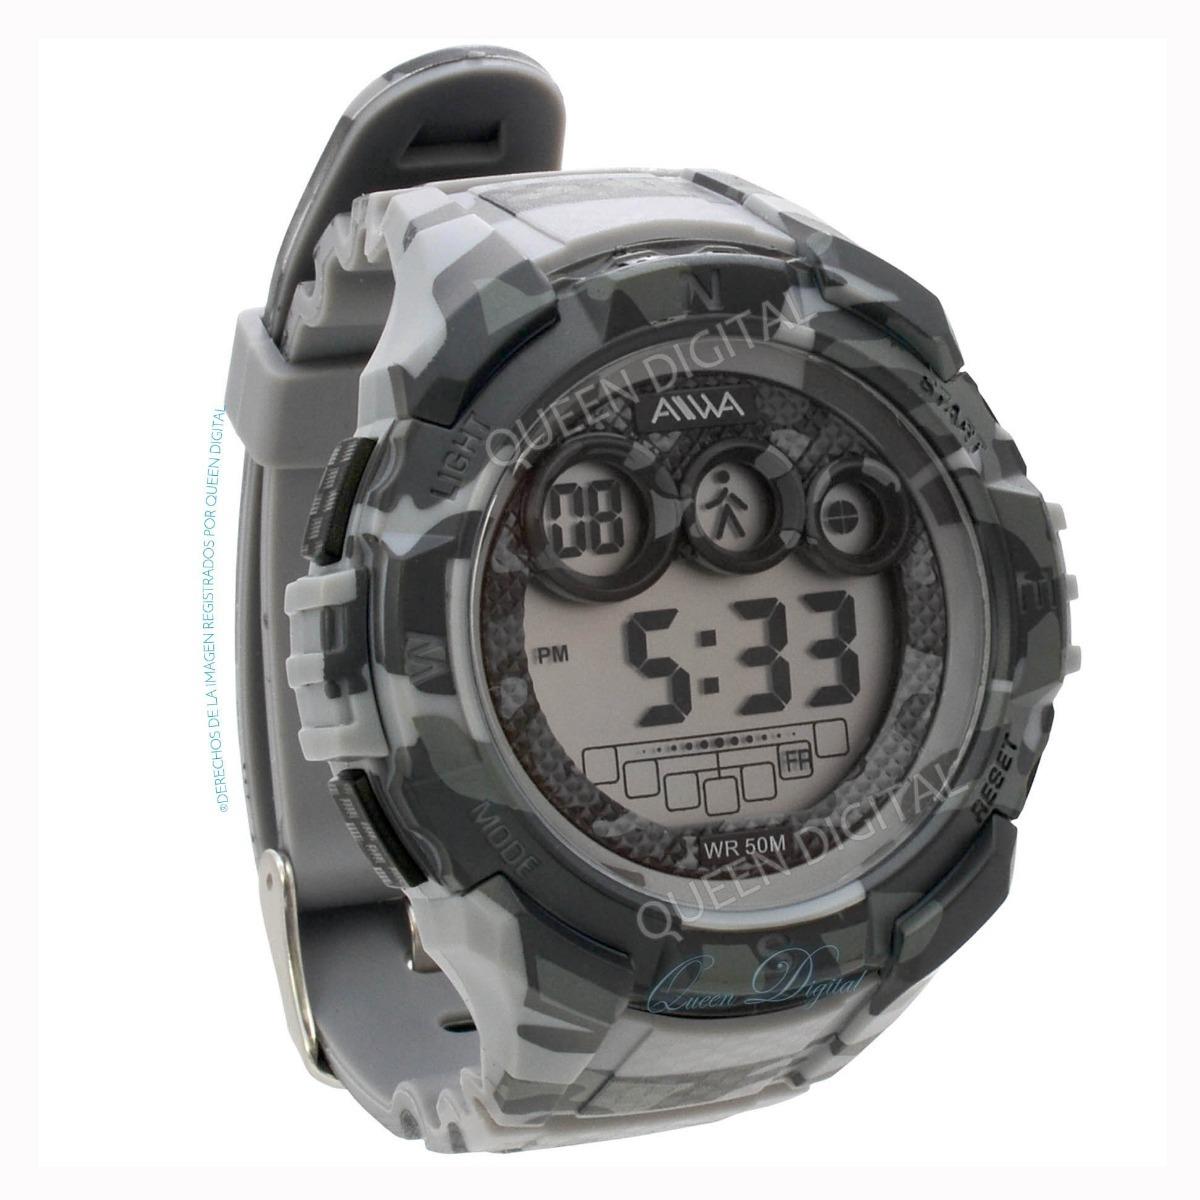 a8e628f3a81b reloj sumergible hombre deportivo crono luz 50mt alarma. Cargando zoom.